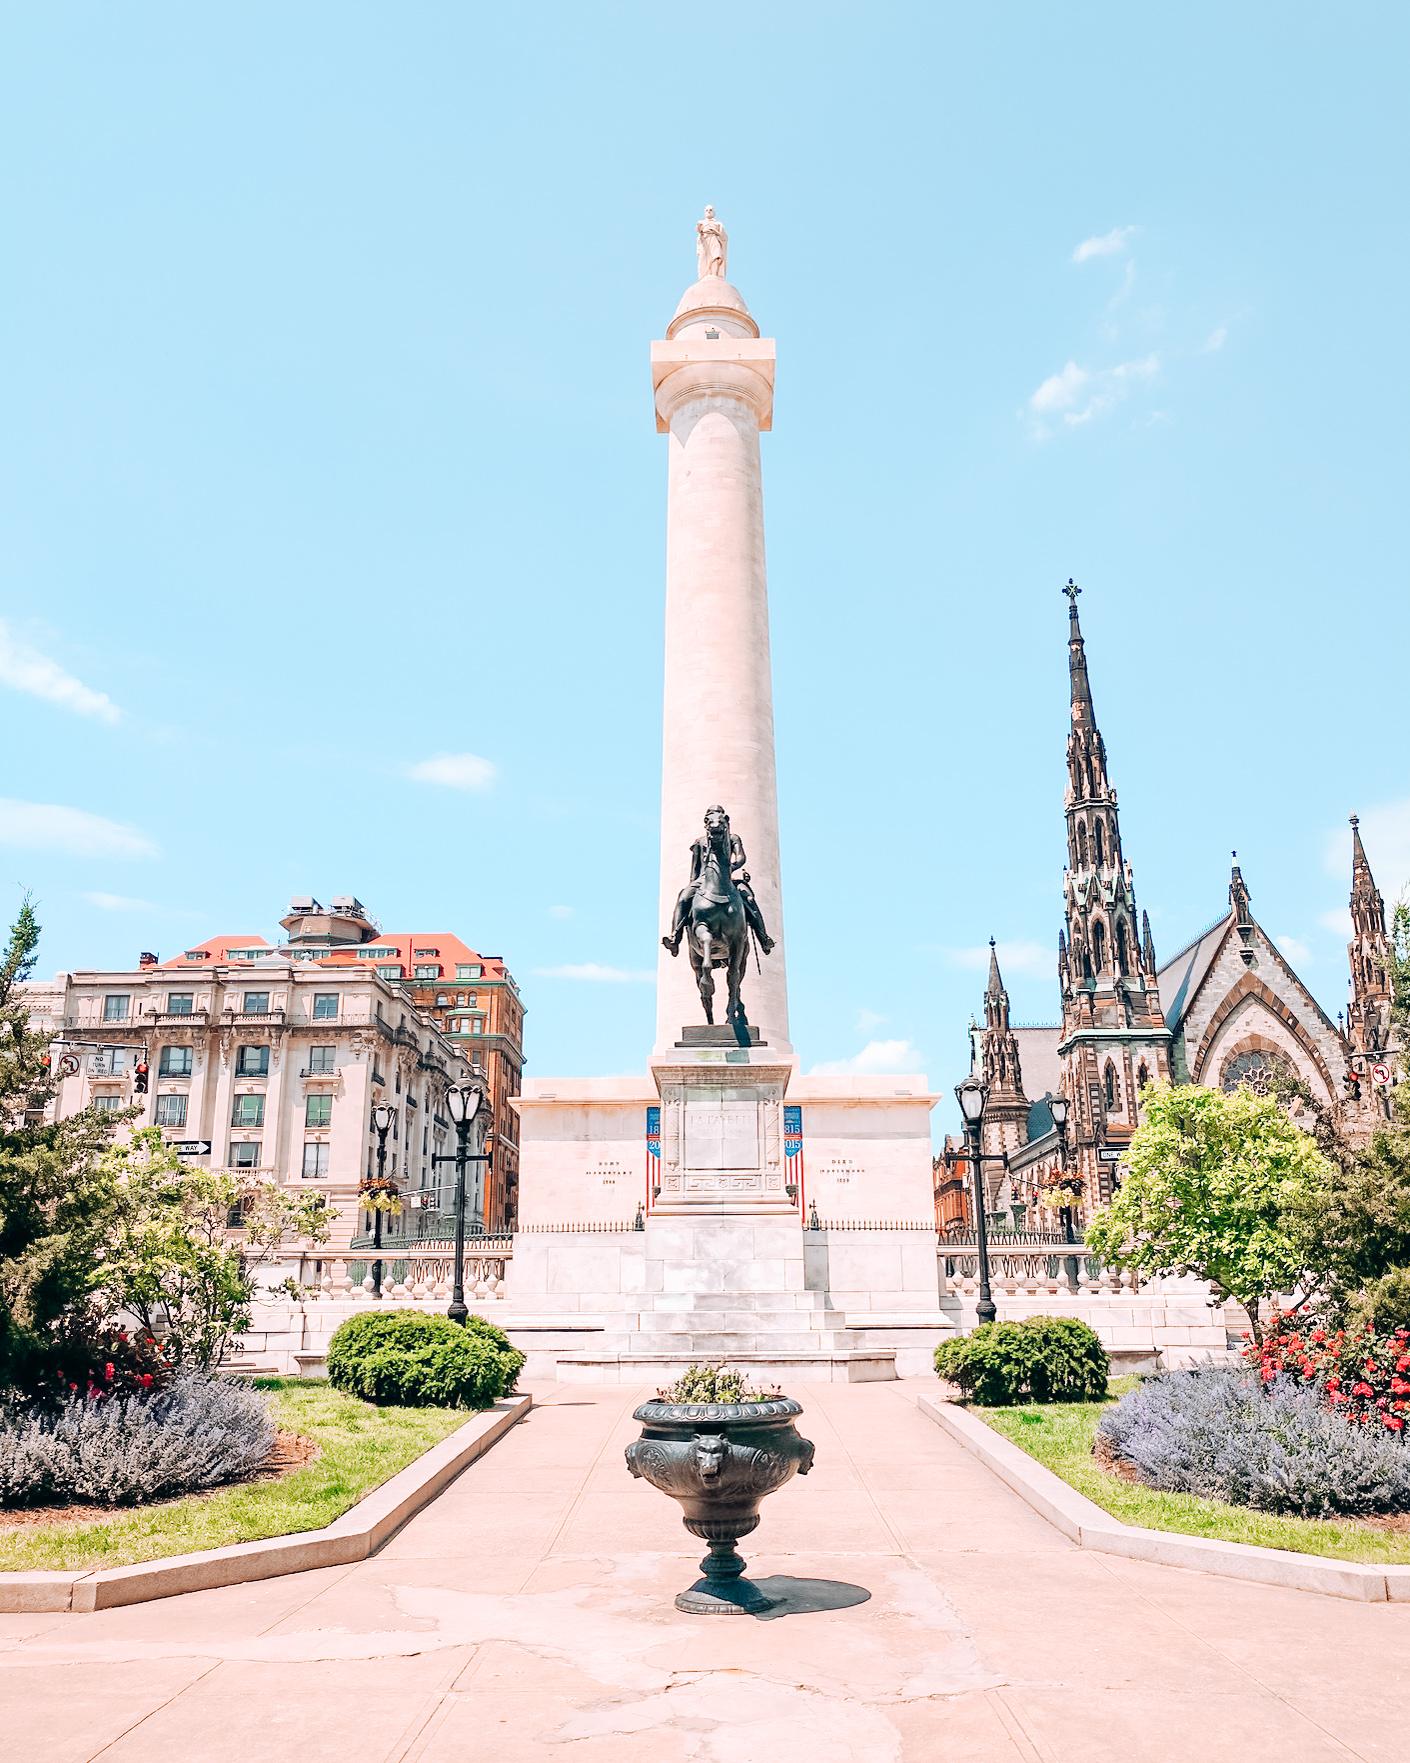 Washington Monument in Baltimore